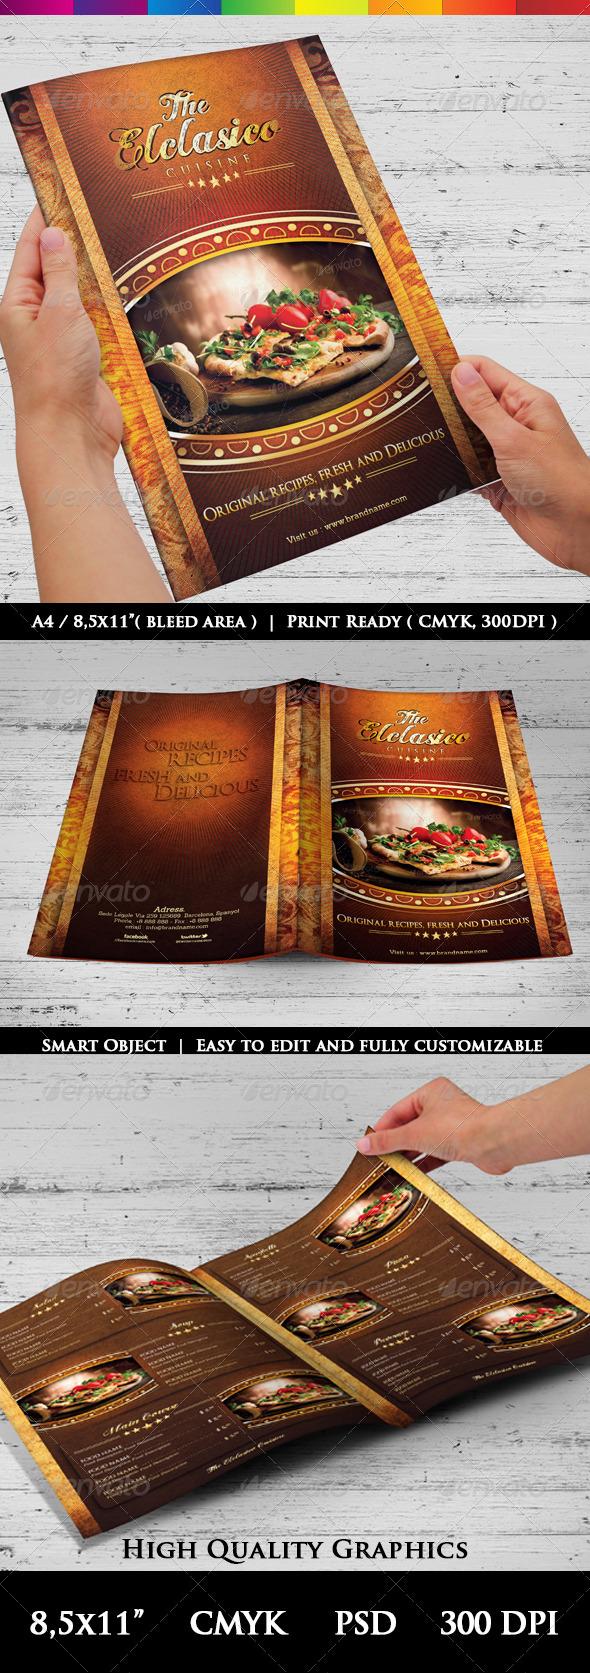 GraphicRiver The Elclasico Cuisine Menu Templates 6698634